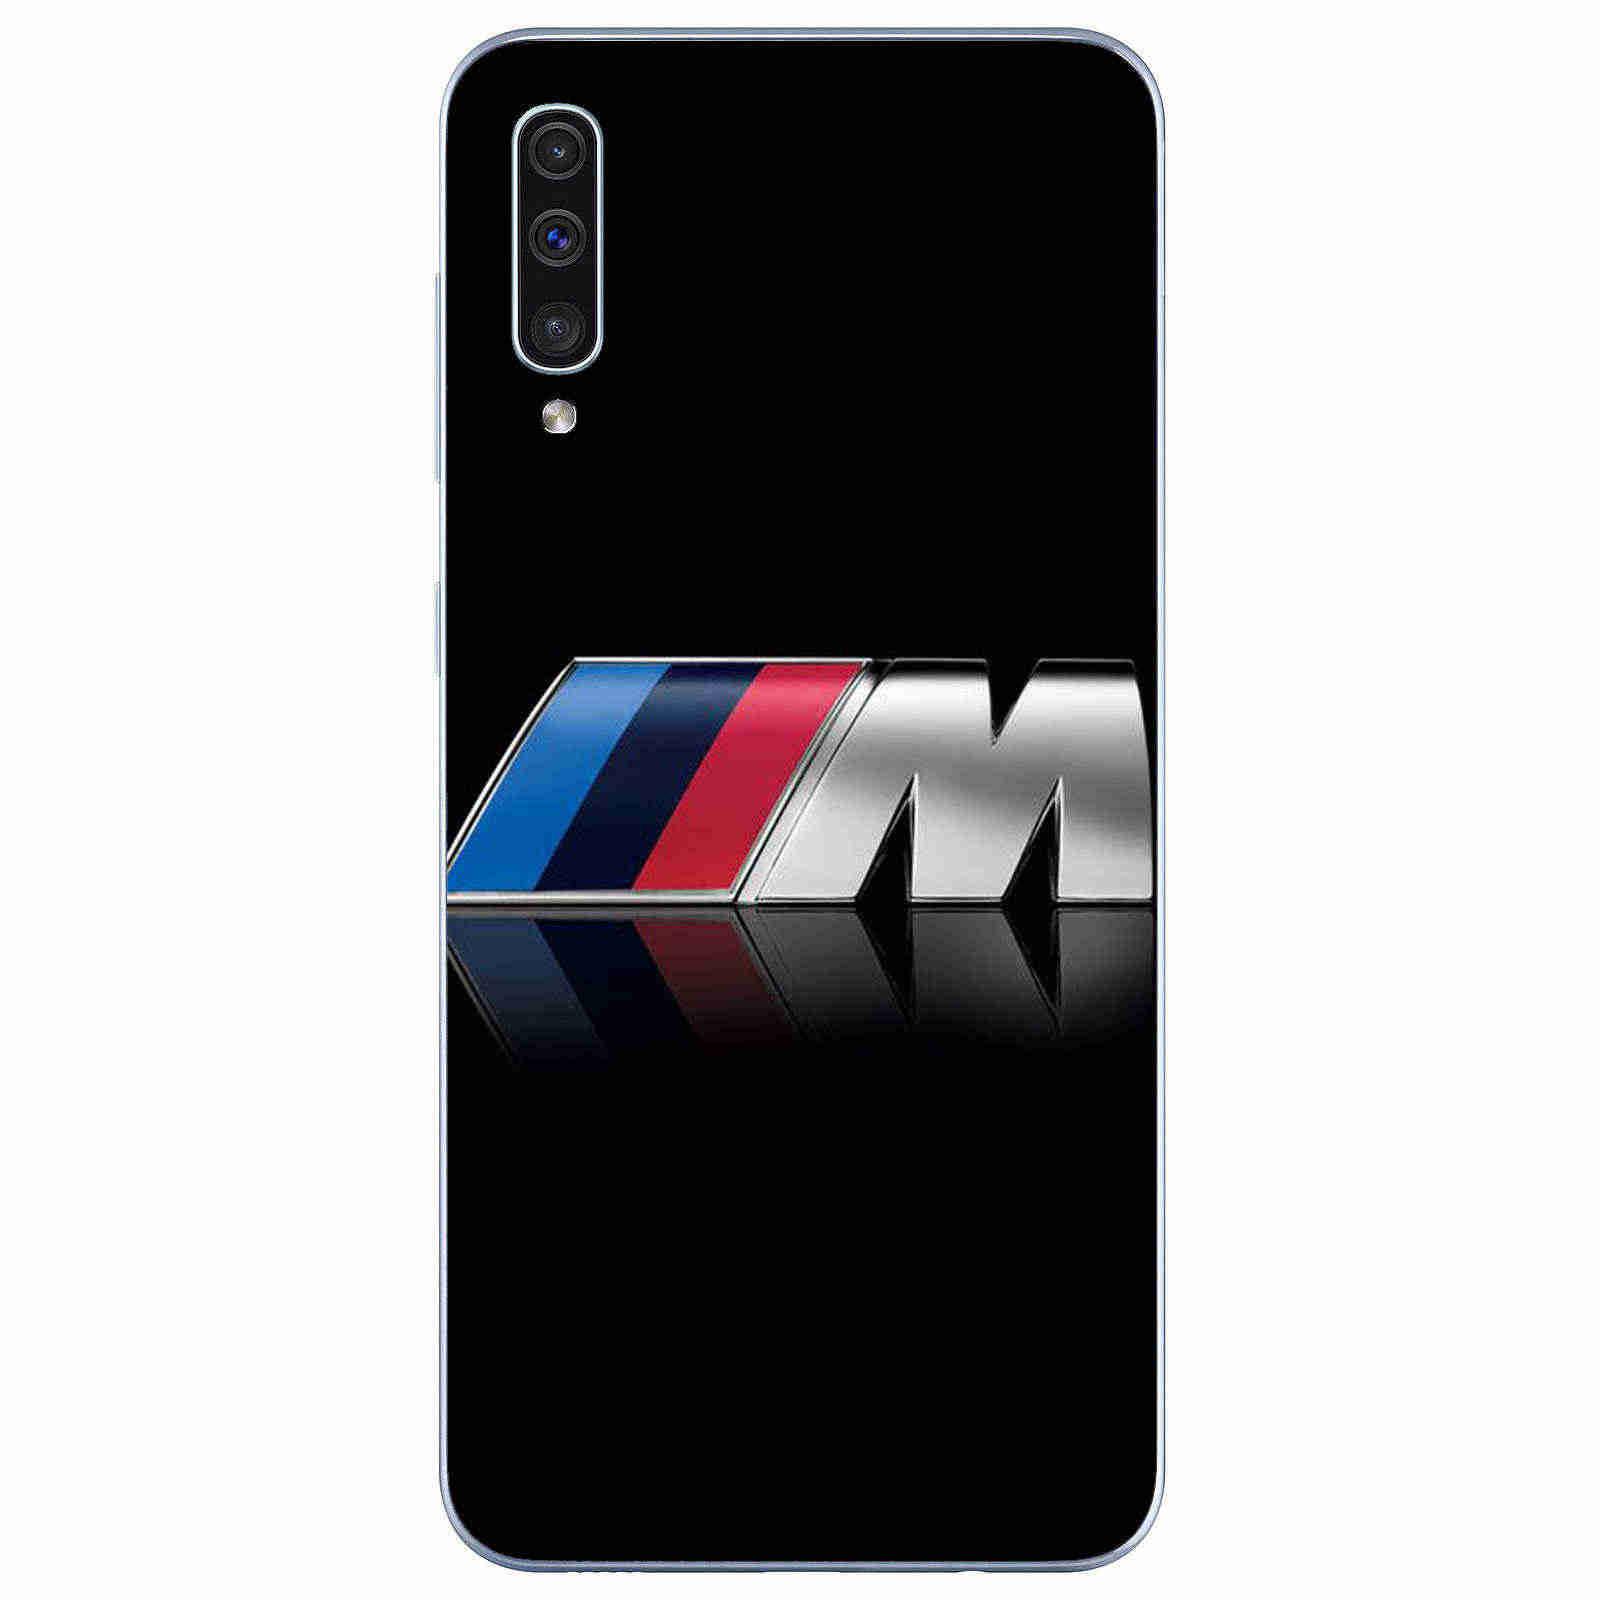 Marca esportiva de luxo BMW macio TPU tampa do telefone Para samsung galaxy J5 J6 J7 J8 A5 A7 2016 2017 A6 a82018Plus A750